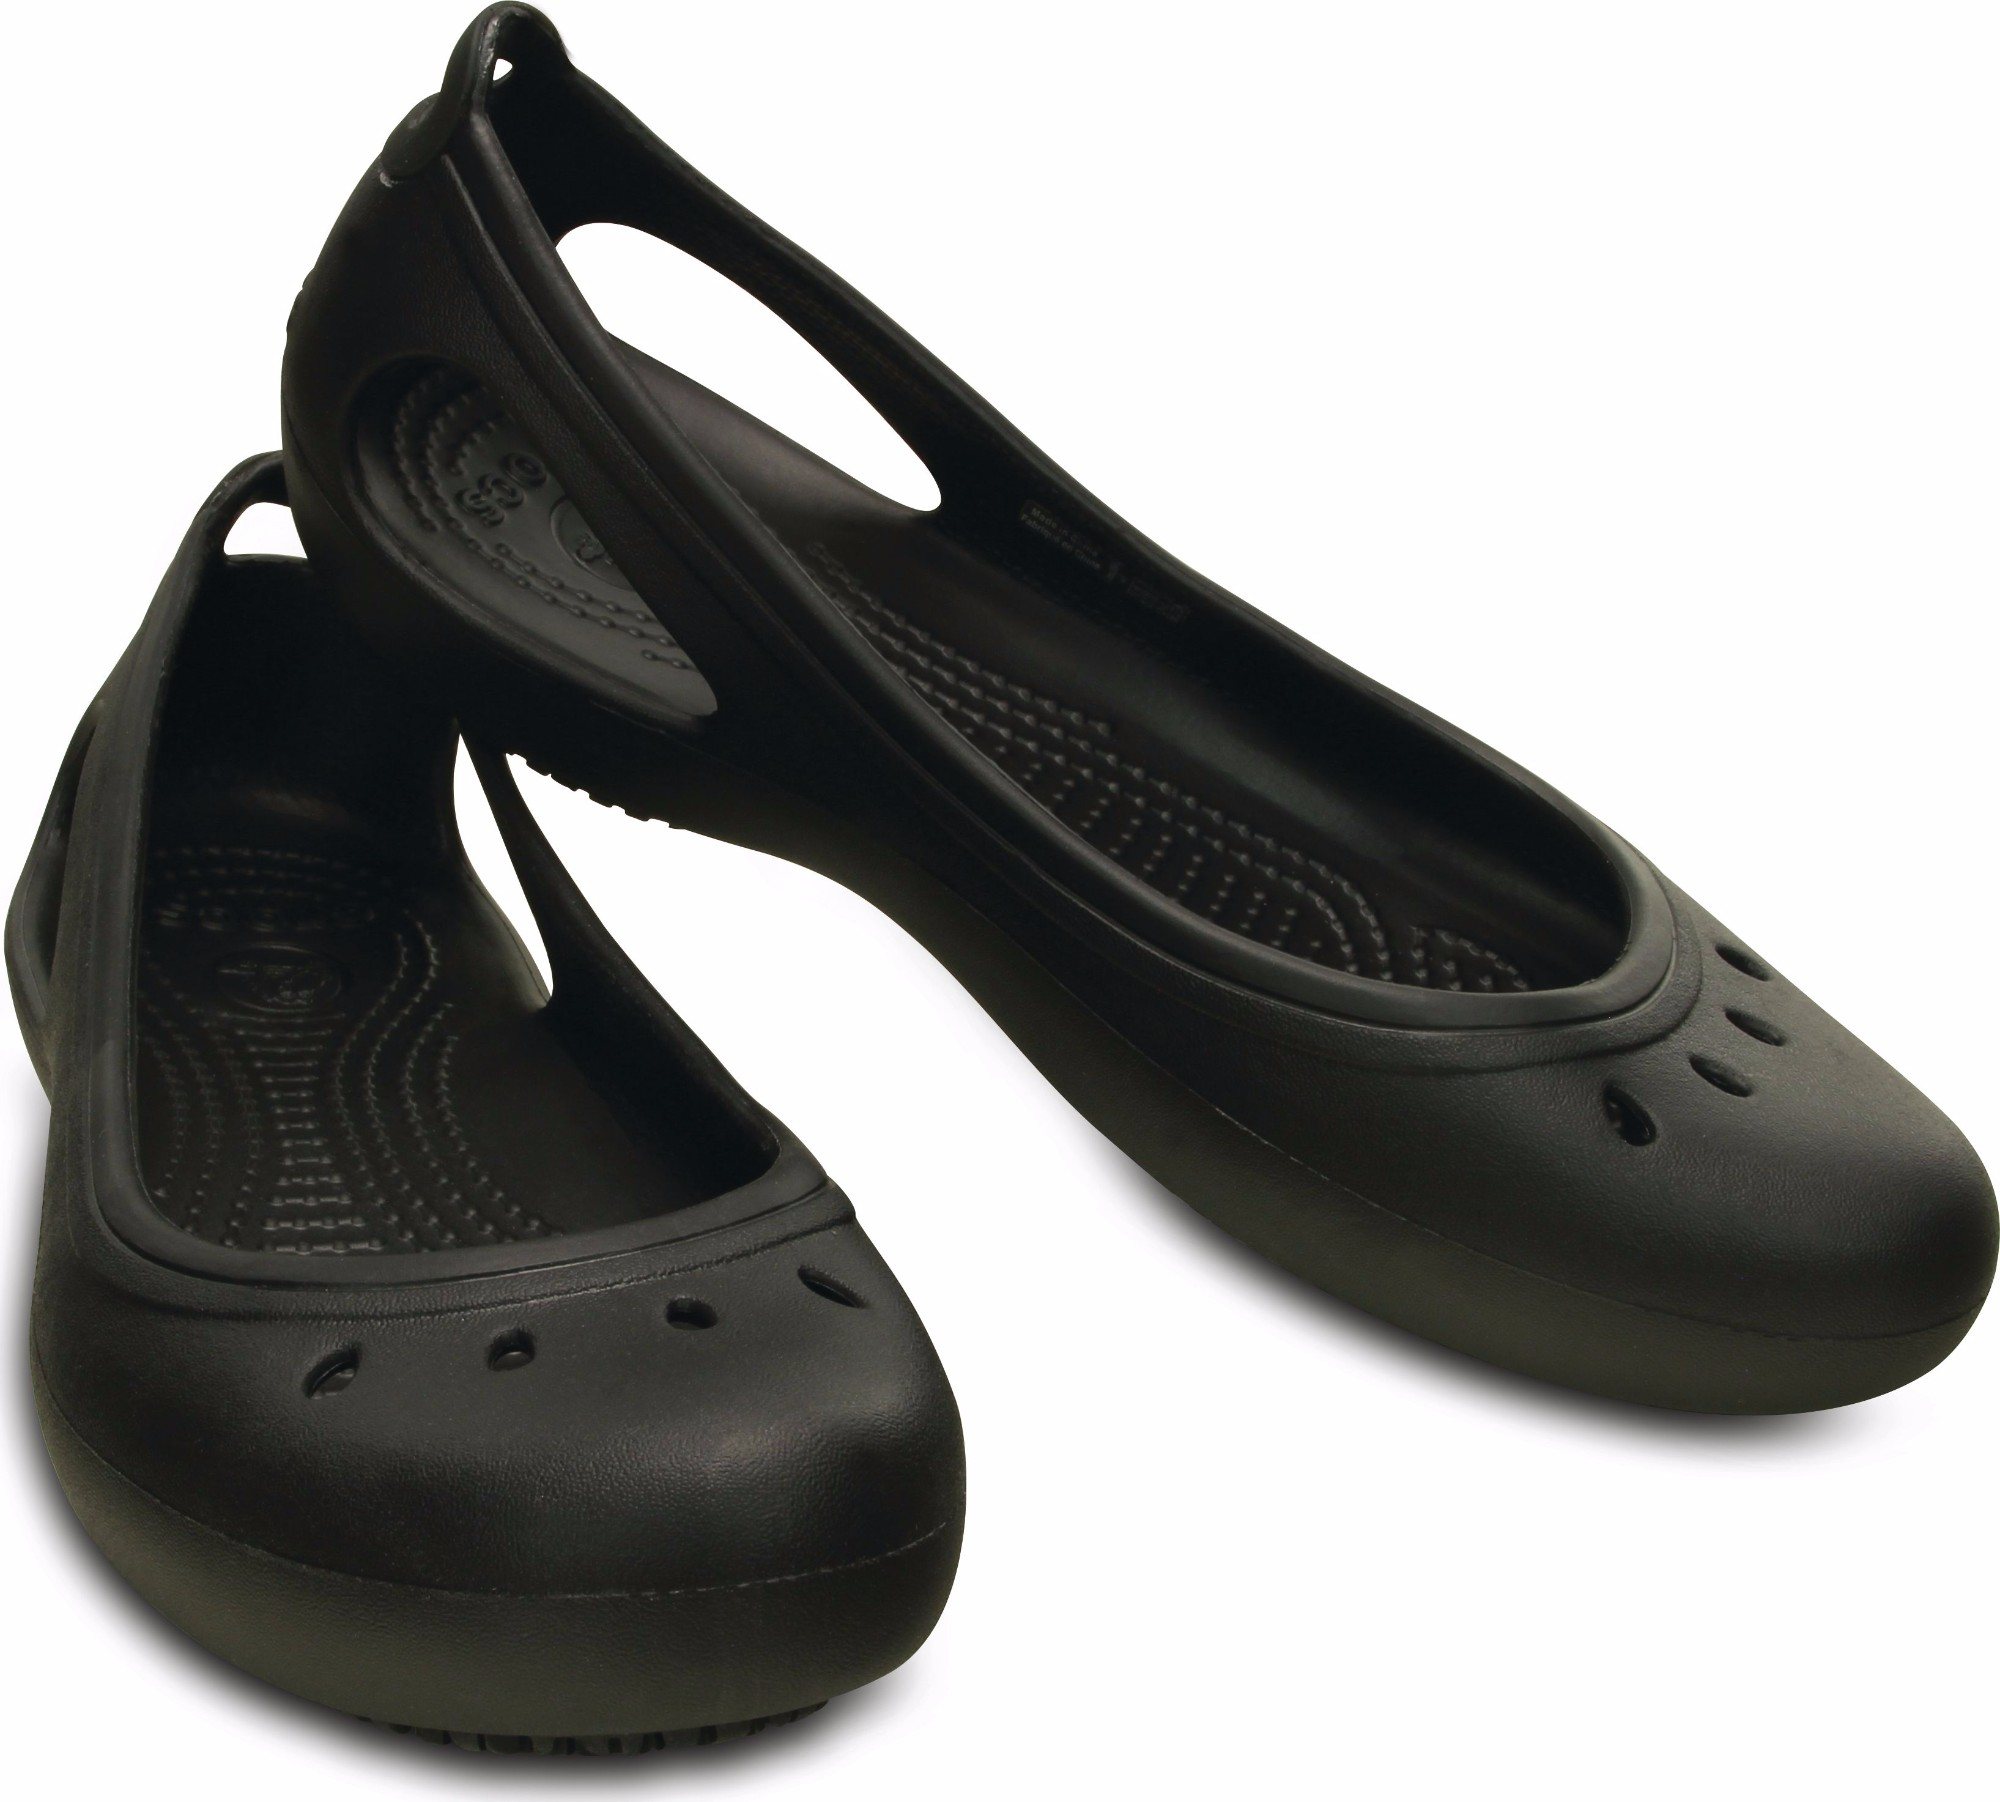 Crocs™ Kadee Work Flat | OPEN24.LT